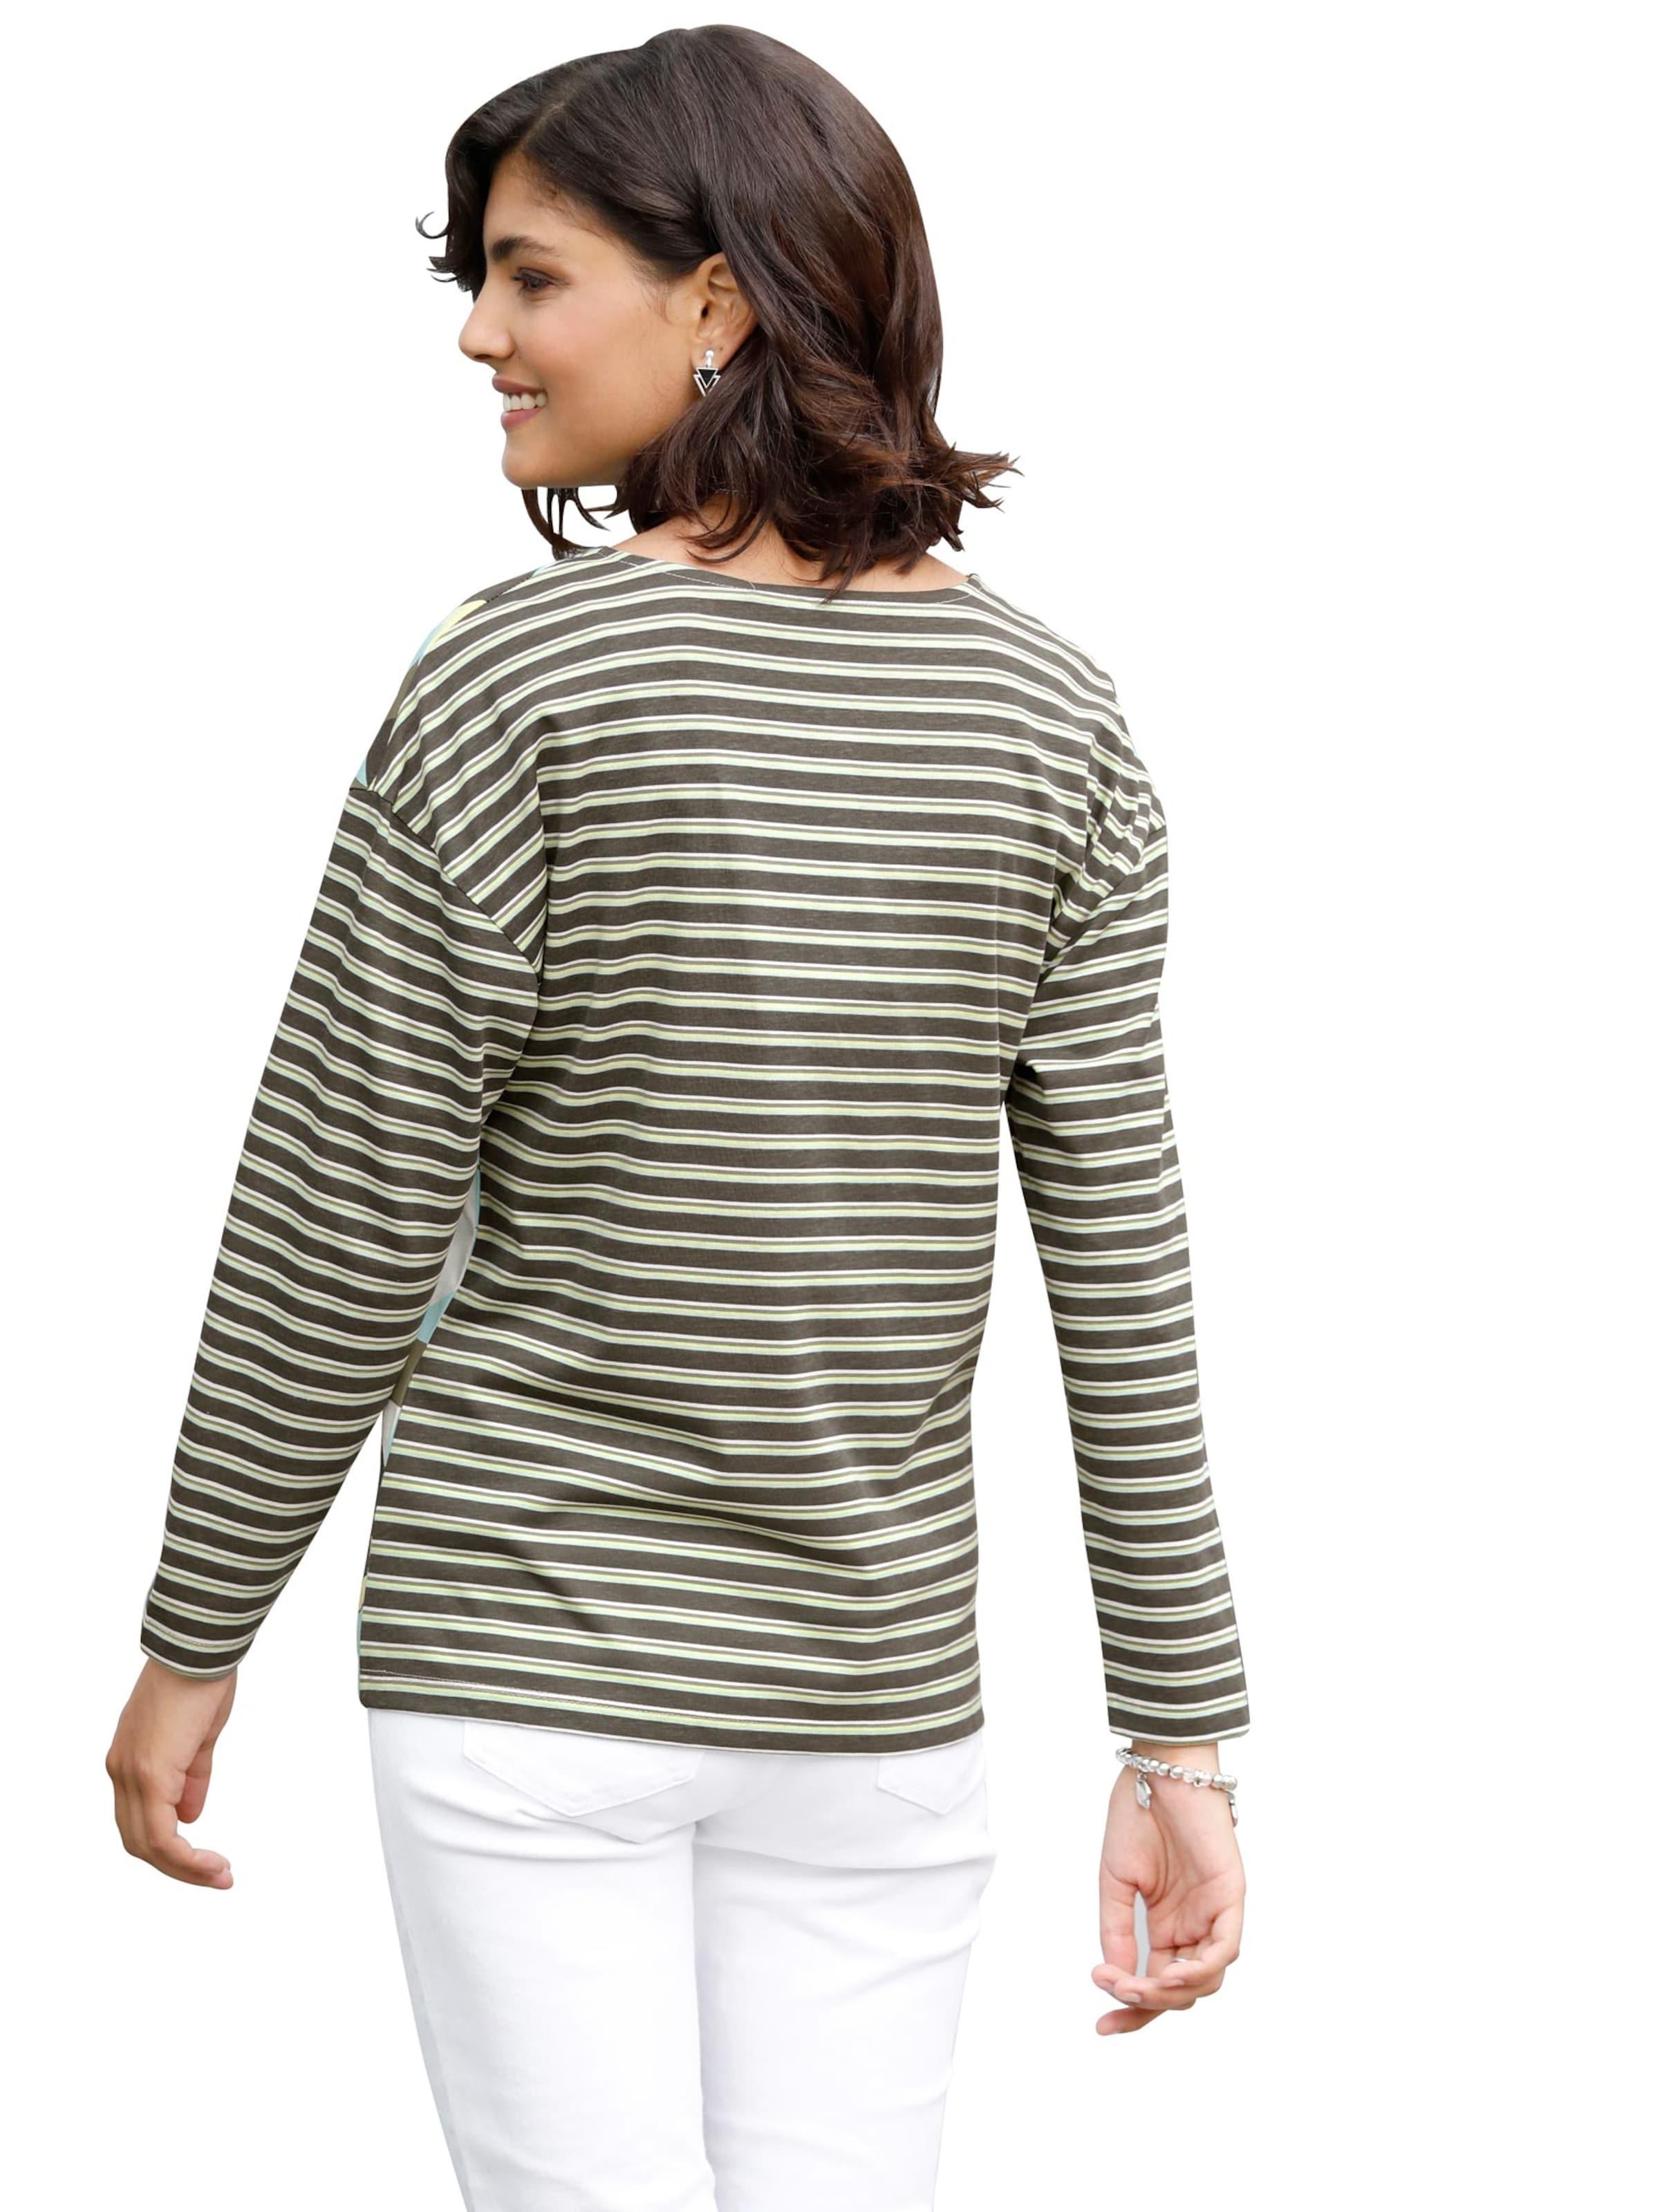 Damen Shirt khaki-gemustert